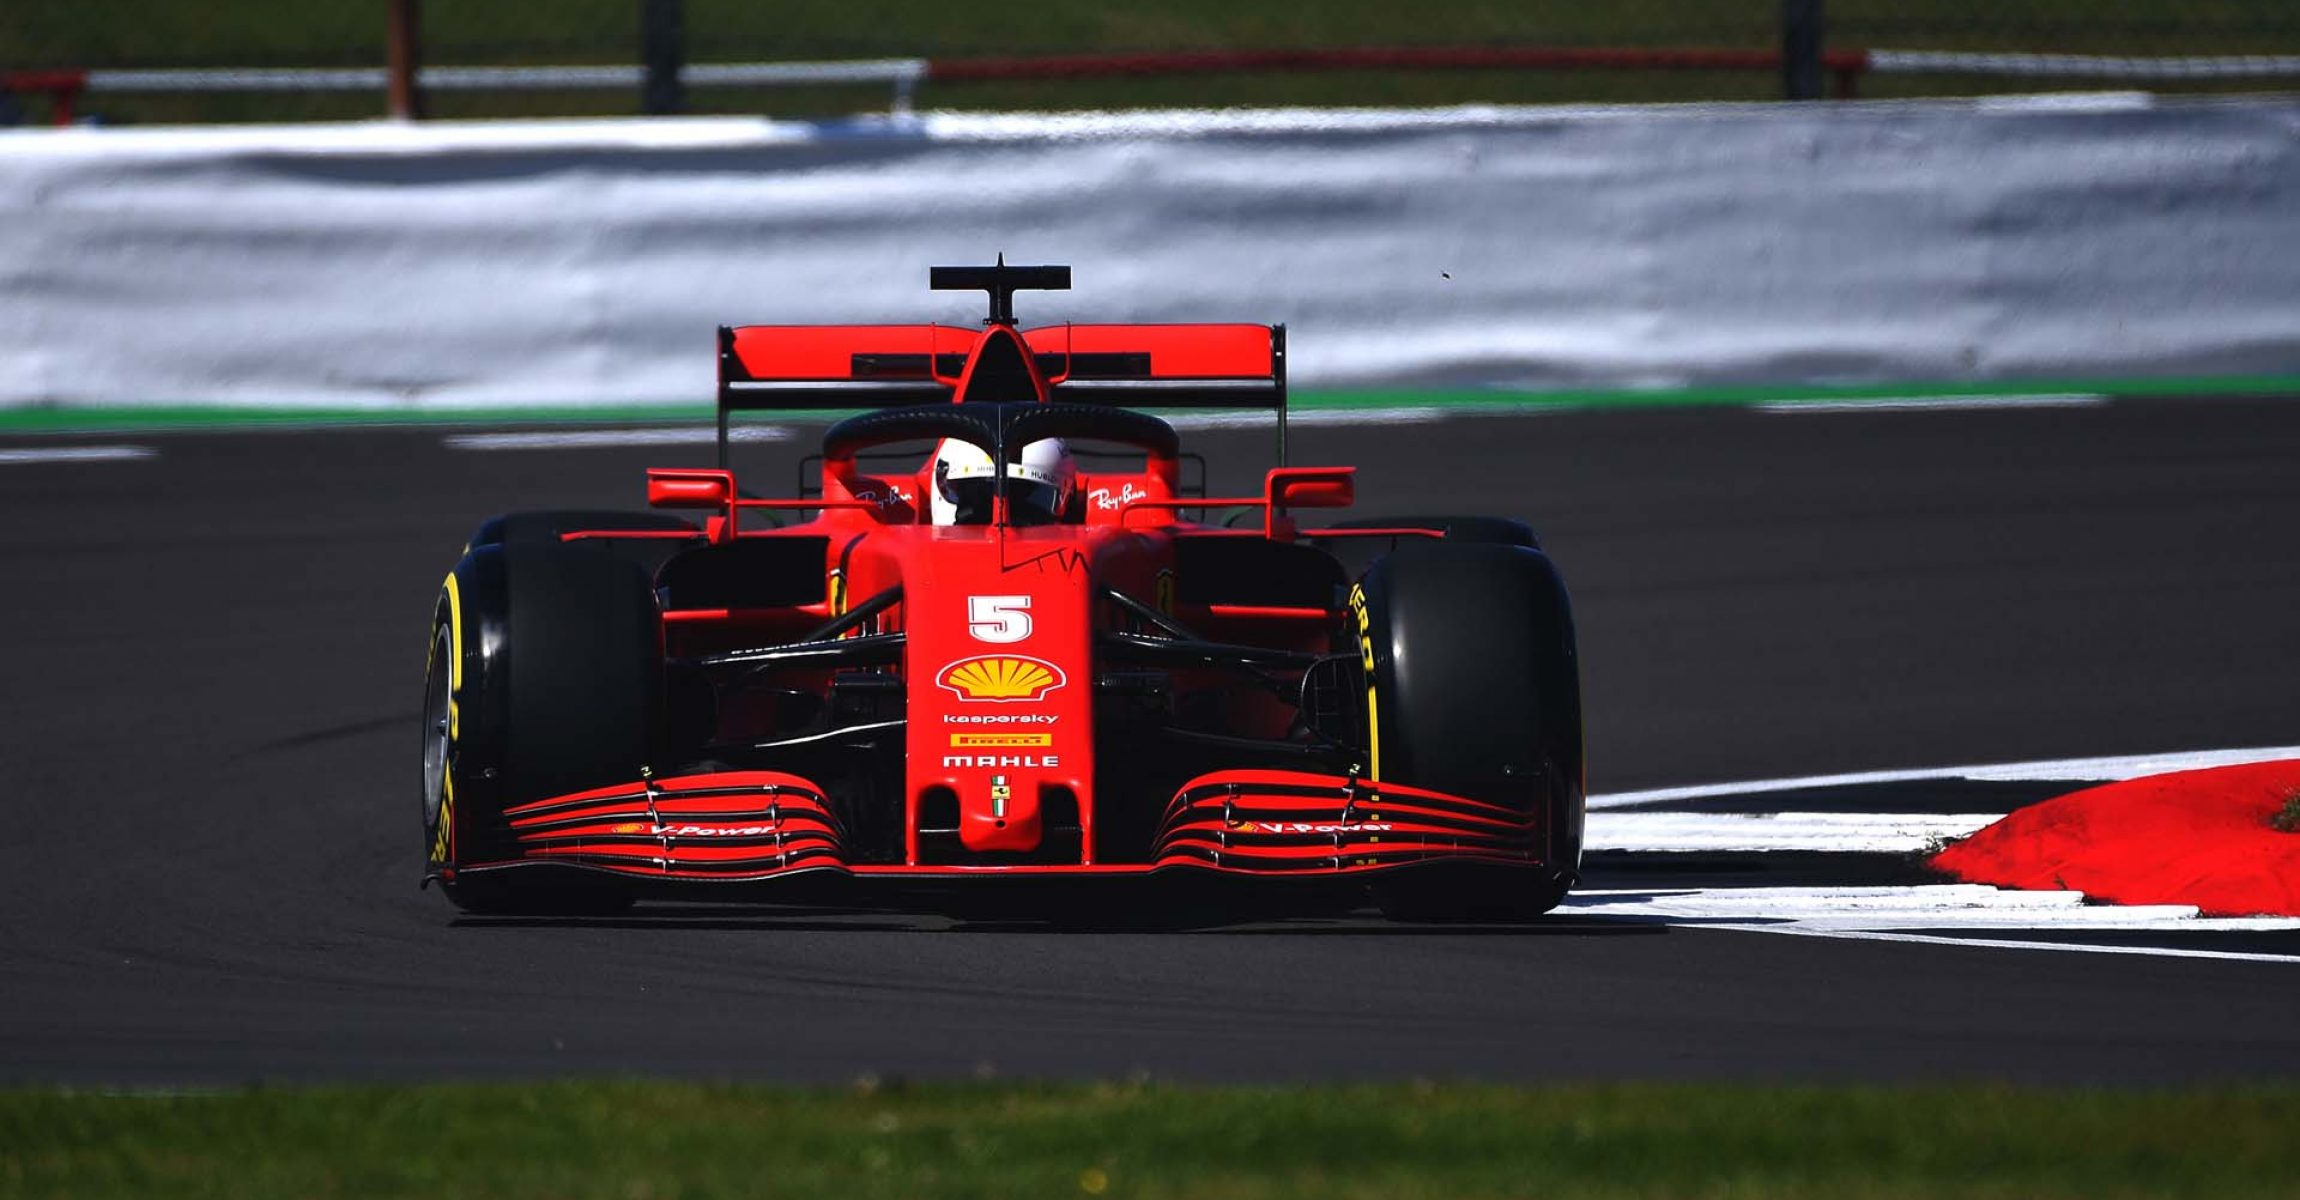 GP GRAN BRETAGNA F1/2020 - VENERDÌ 31/07/2020 credit: @Scuderia Ferrari Press Office Sebastian Vettel